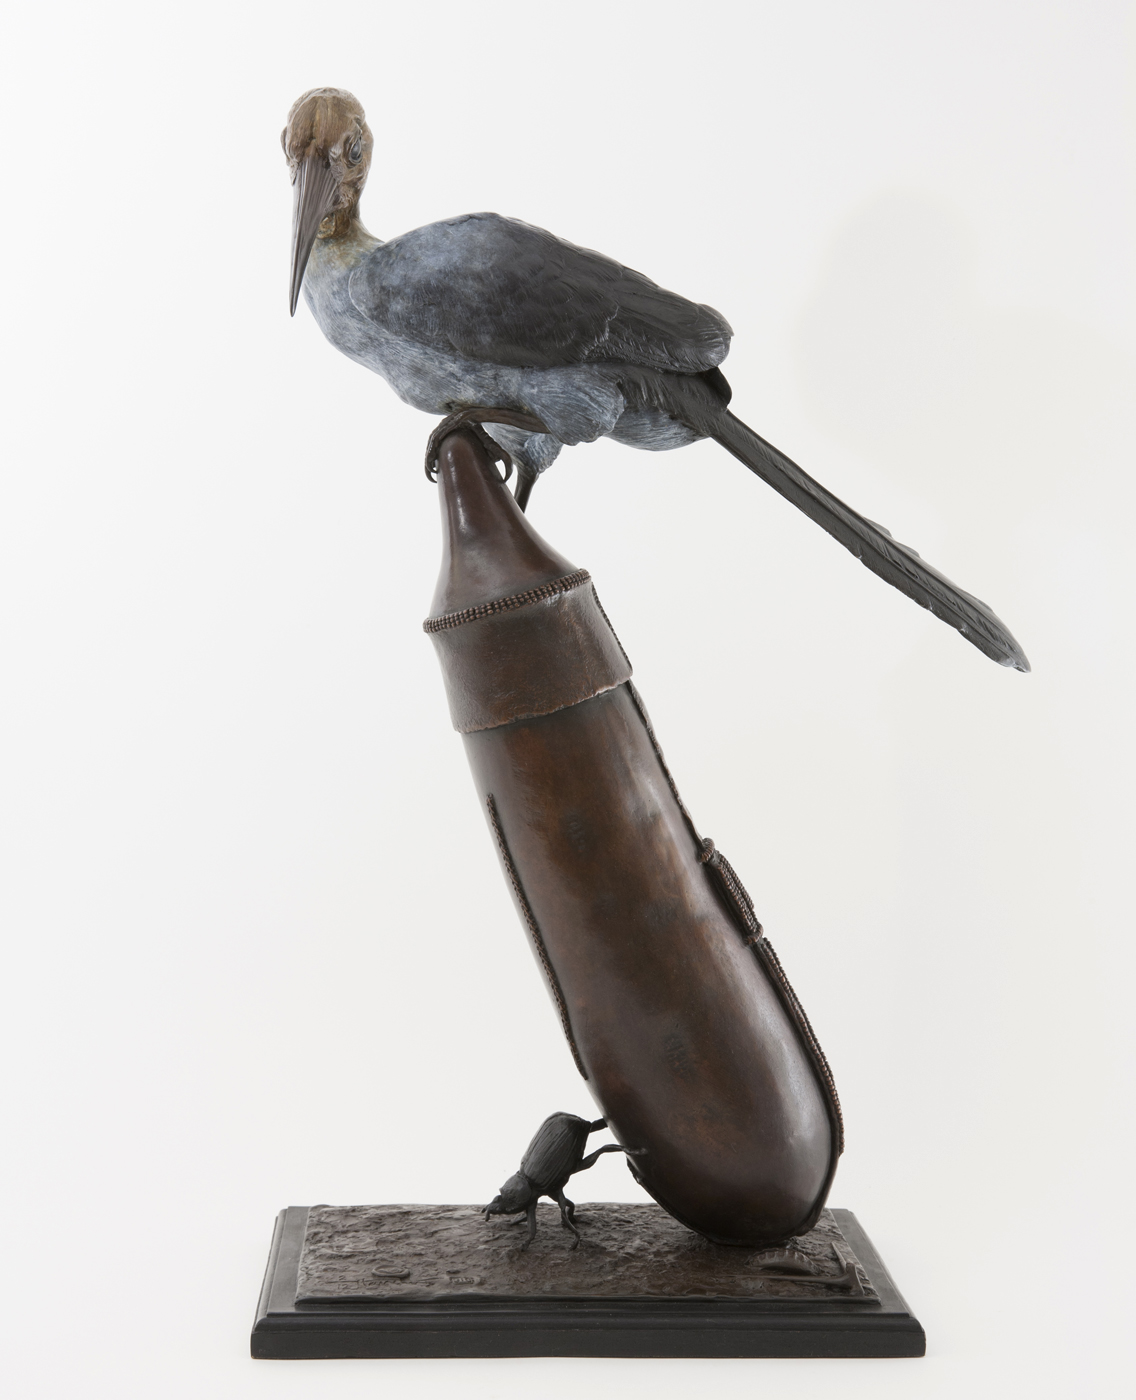 Living Art - Bryan Hanlon - Hornbill and Calabash